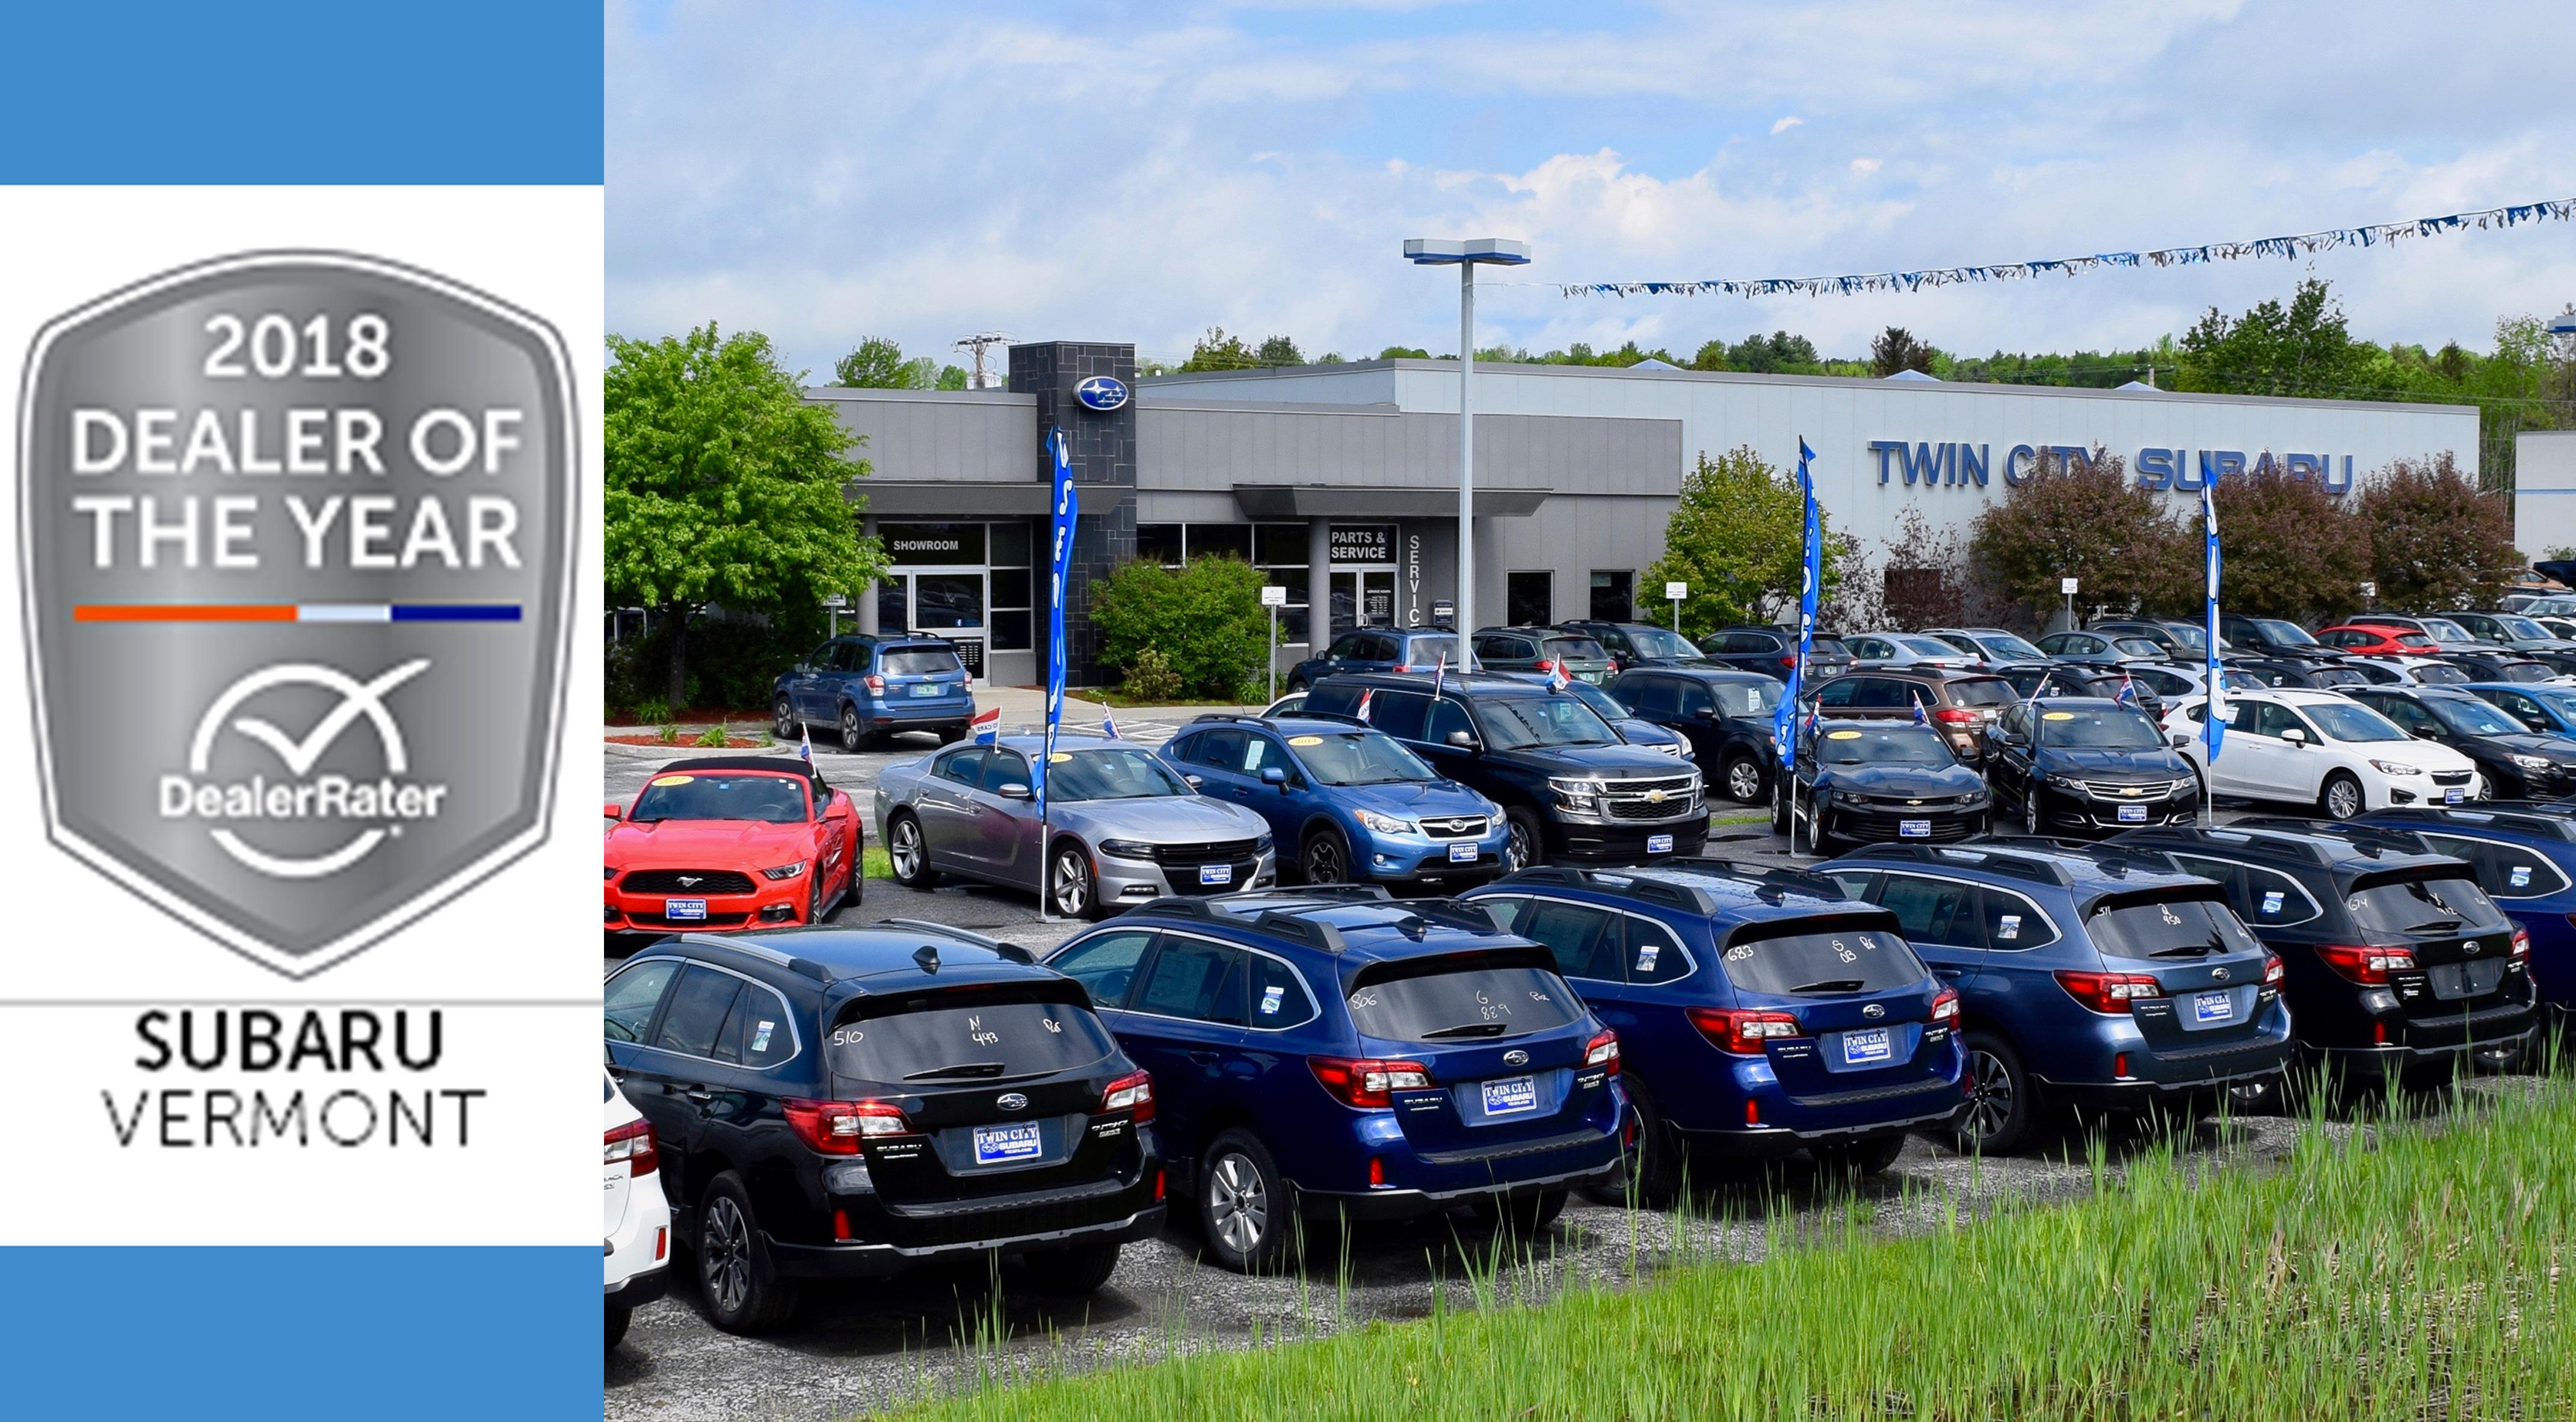 Twin City Subaru Wins 2018 Dealerrater Dealer Of The Year Award 802cars